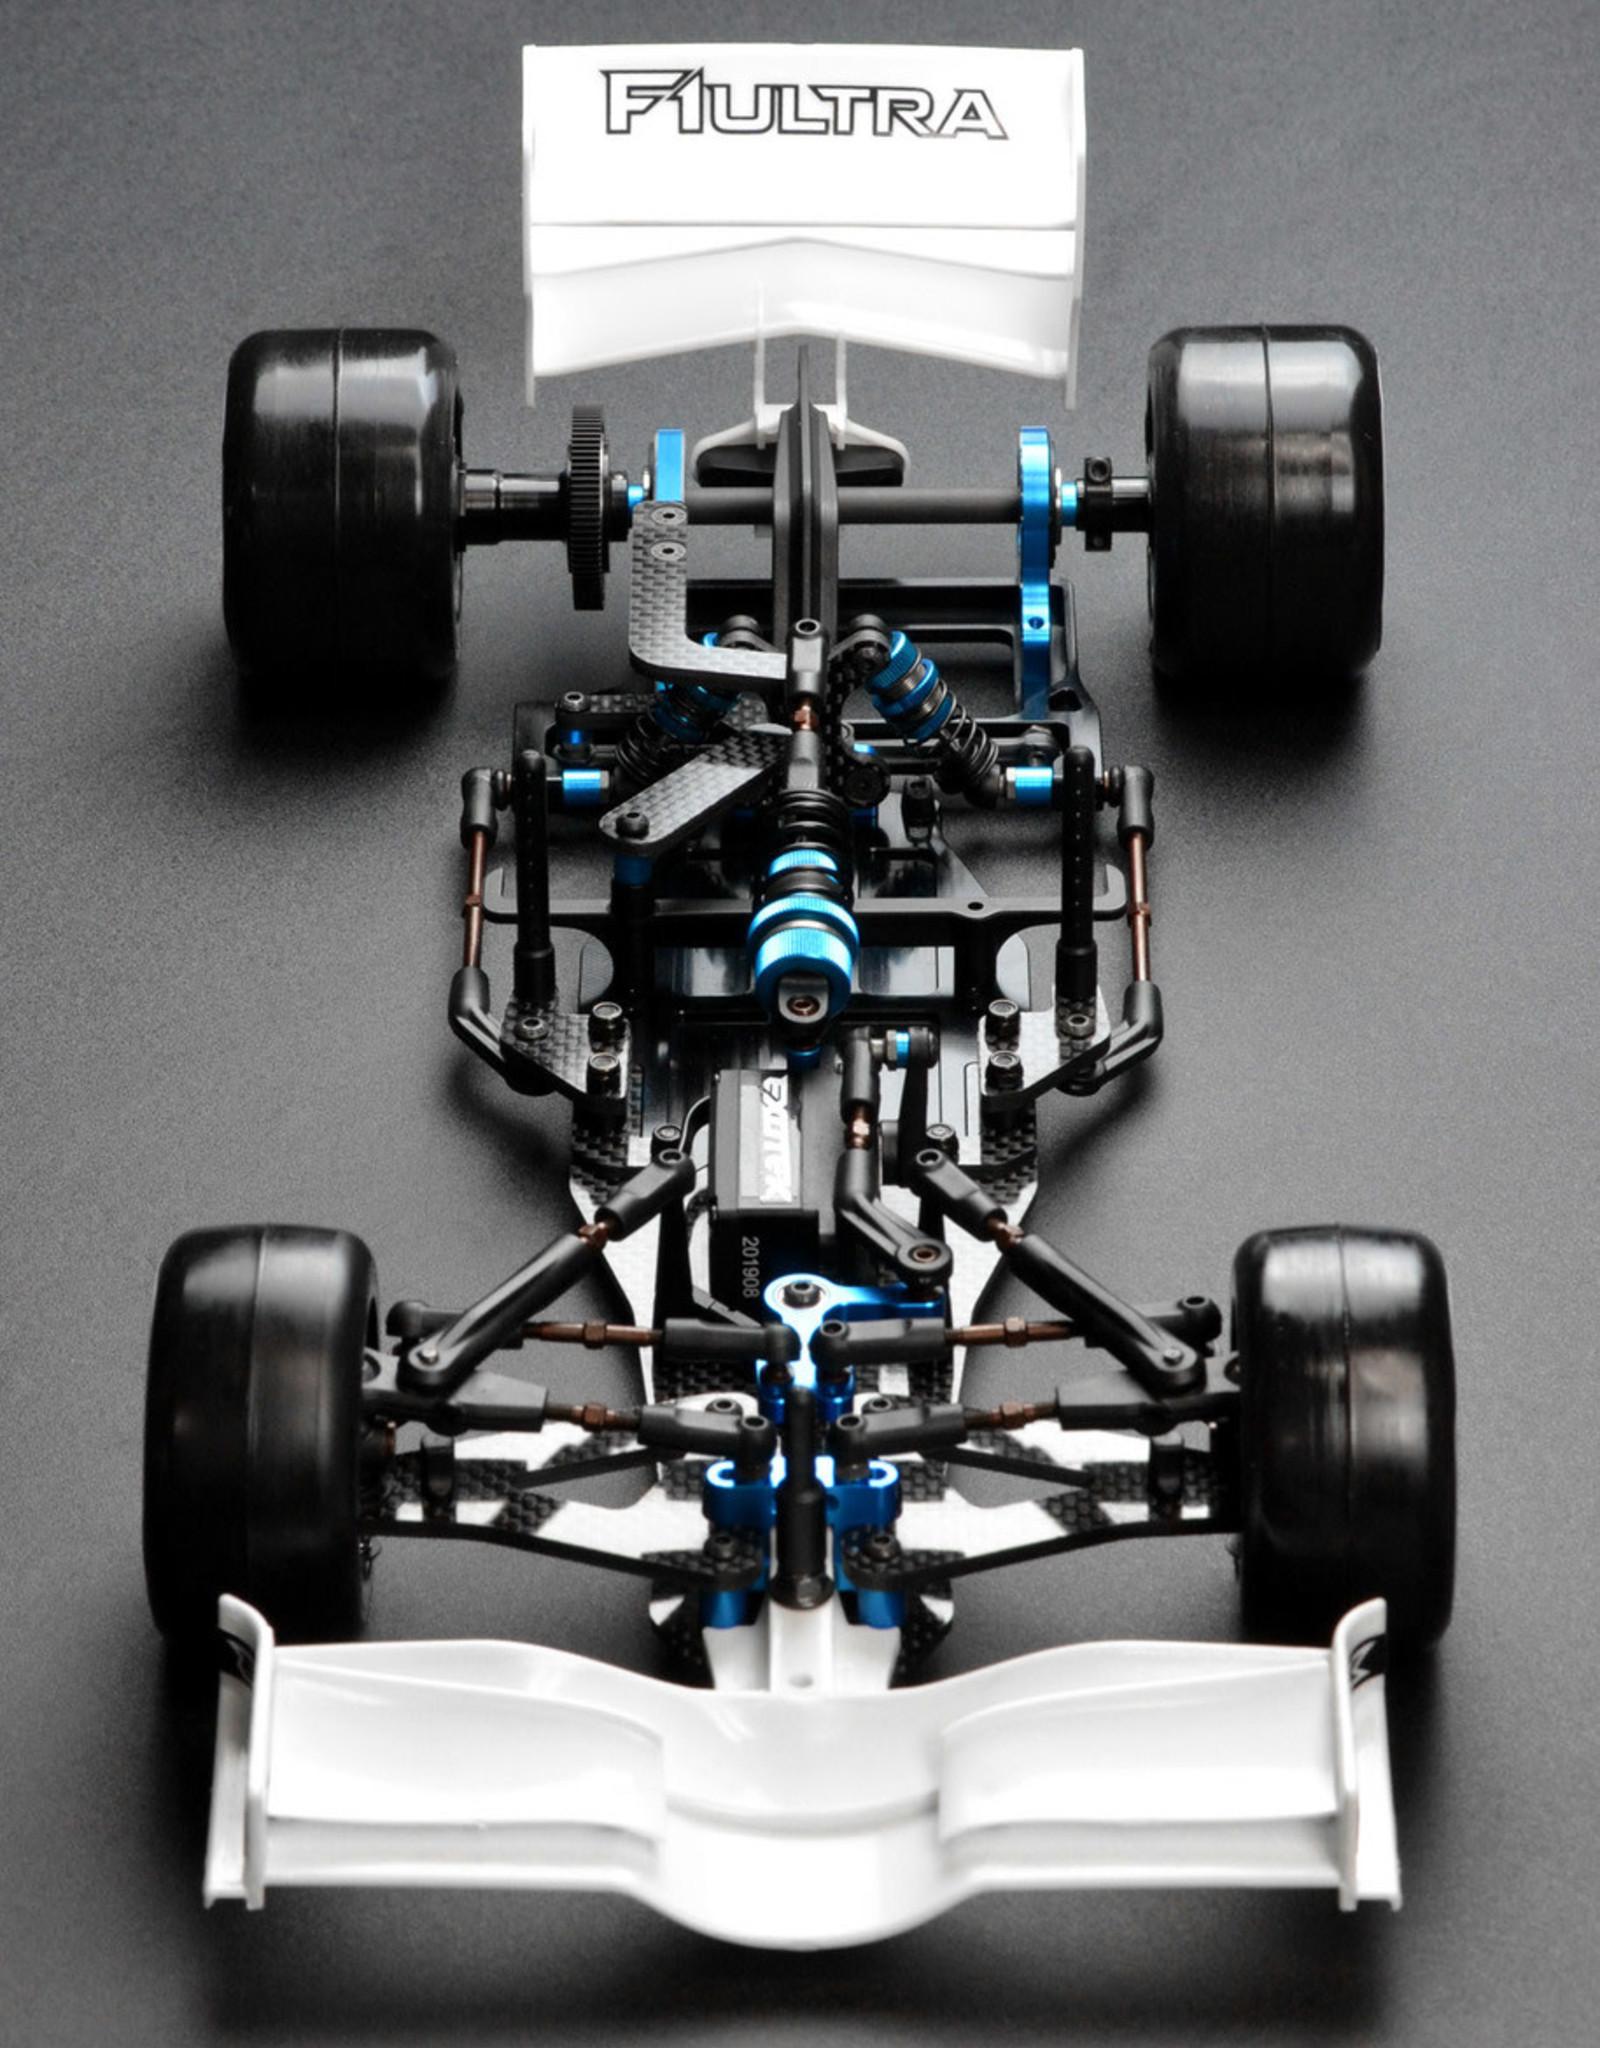 Exotek Exotek F1ULTRA formula car kit 1/10